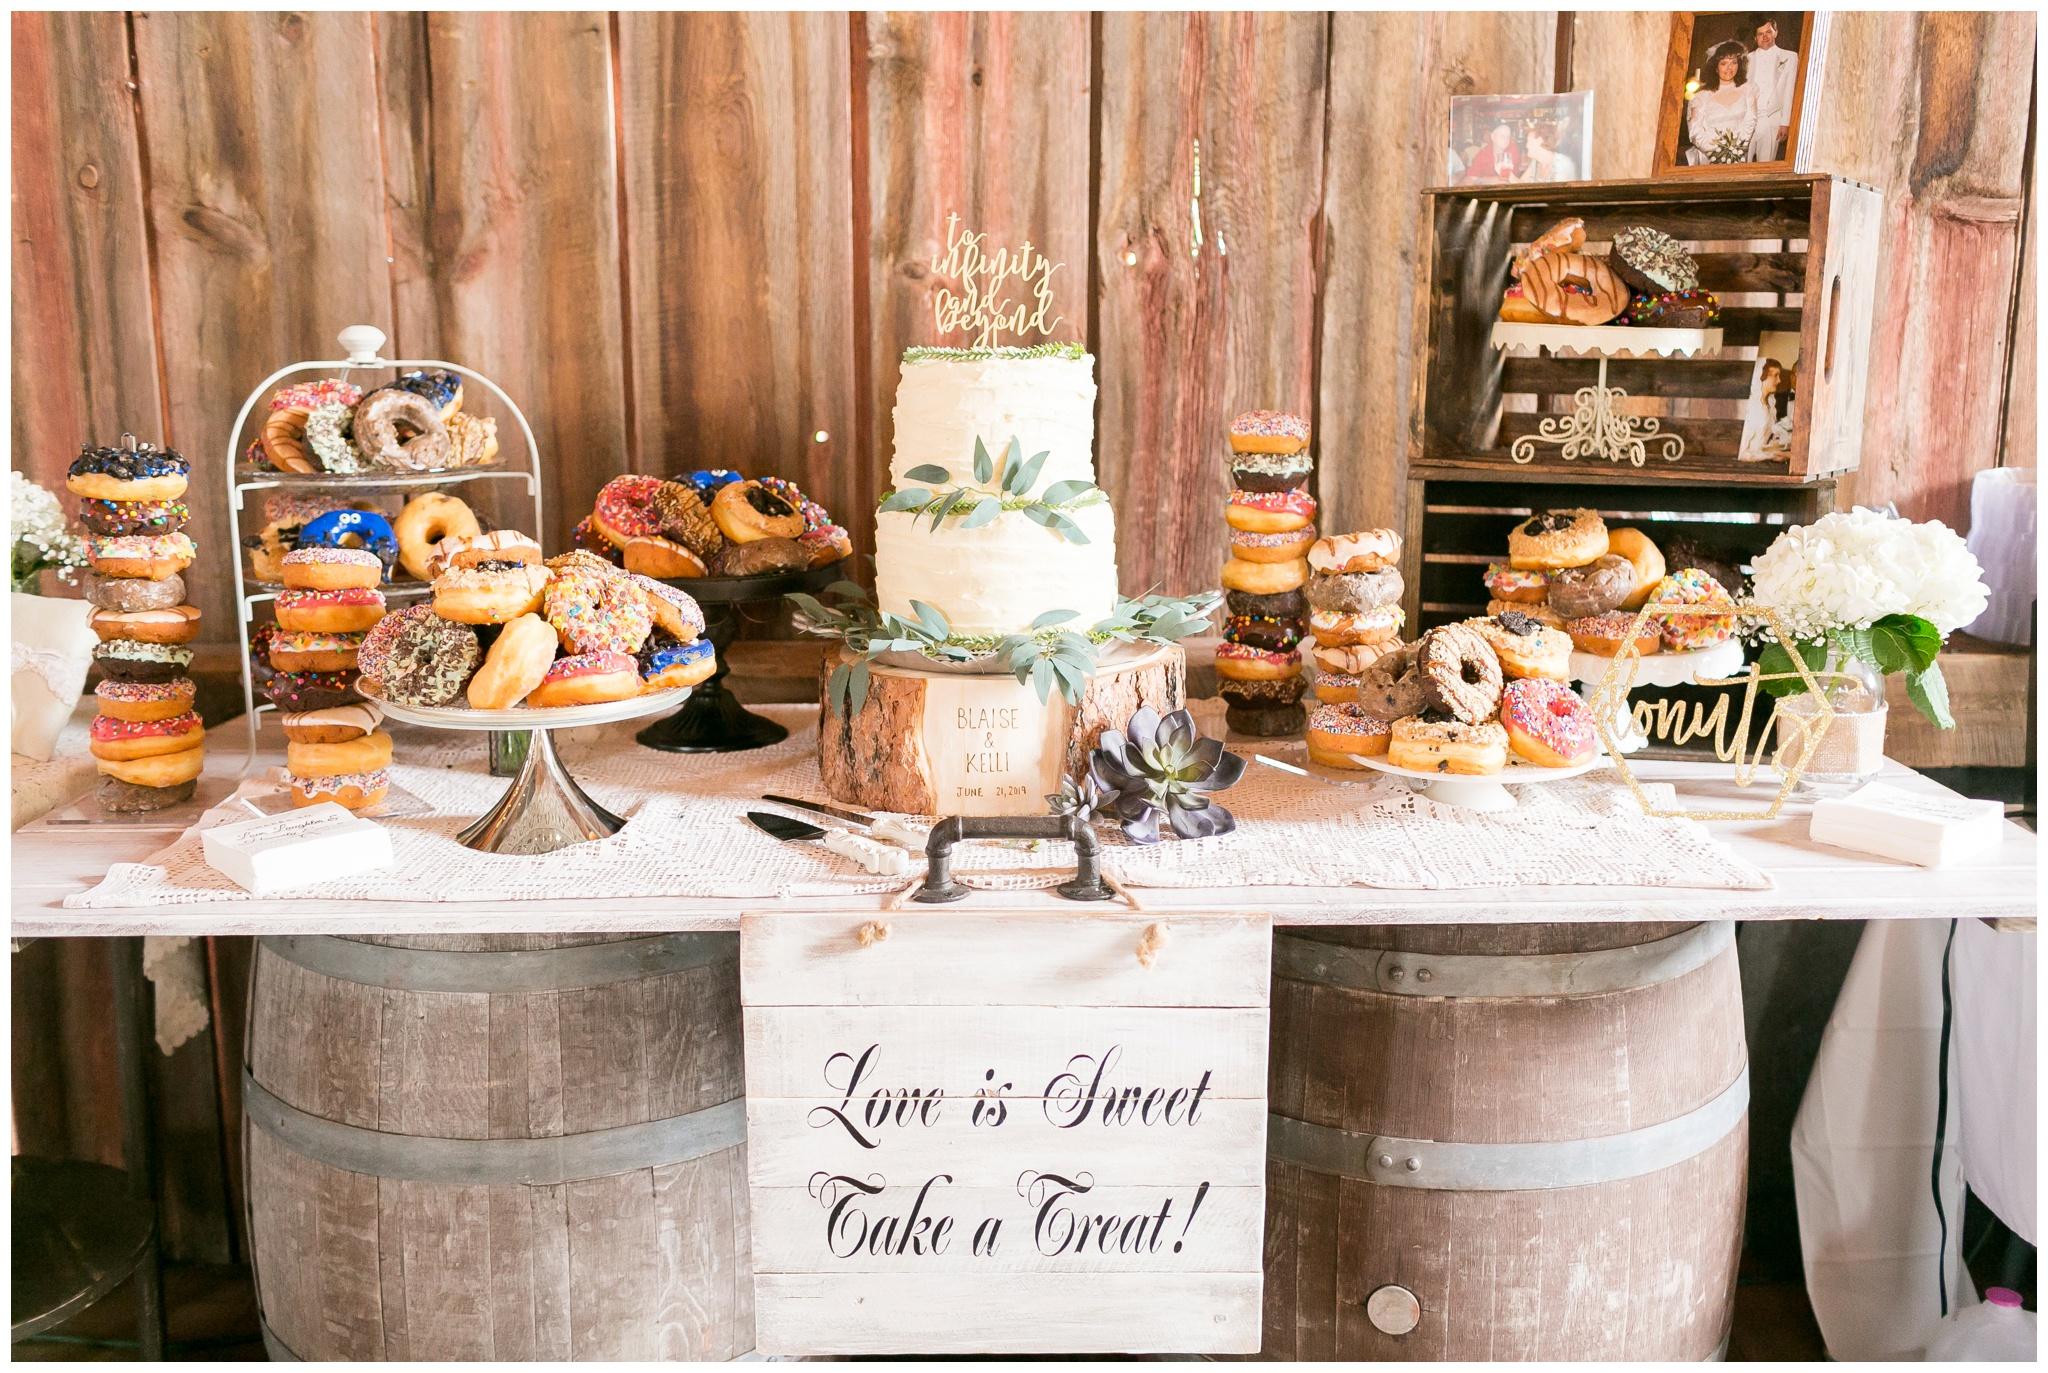 over_the_vines_wedding_edgerton_wisconsin_wedding_caynay_photo_4019.jpg